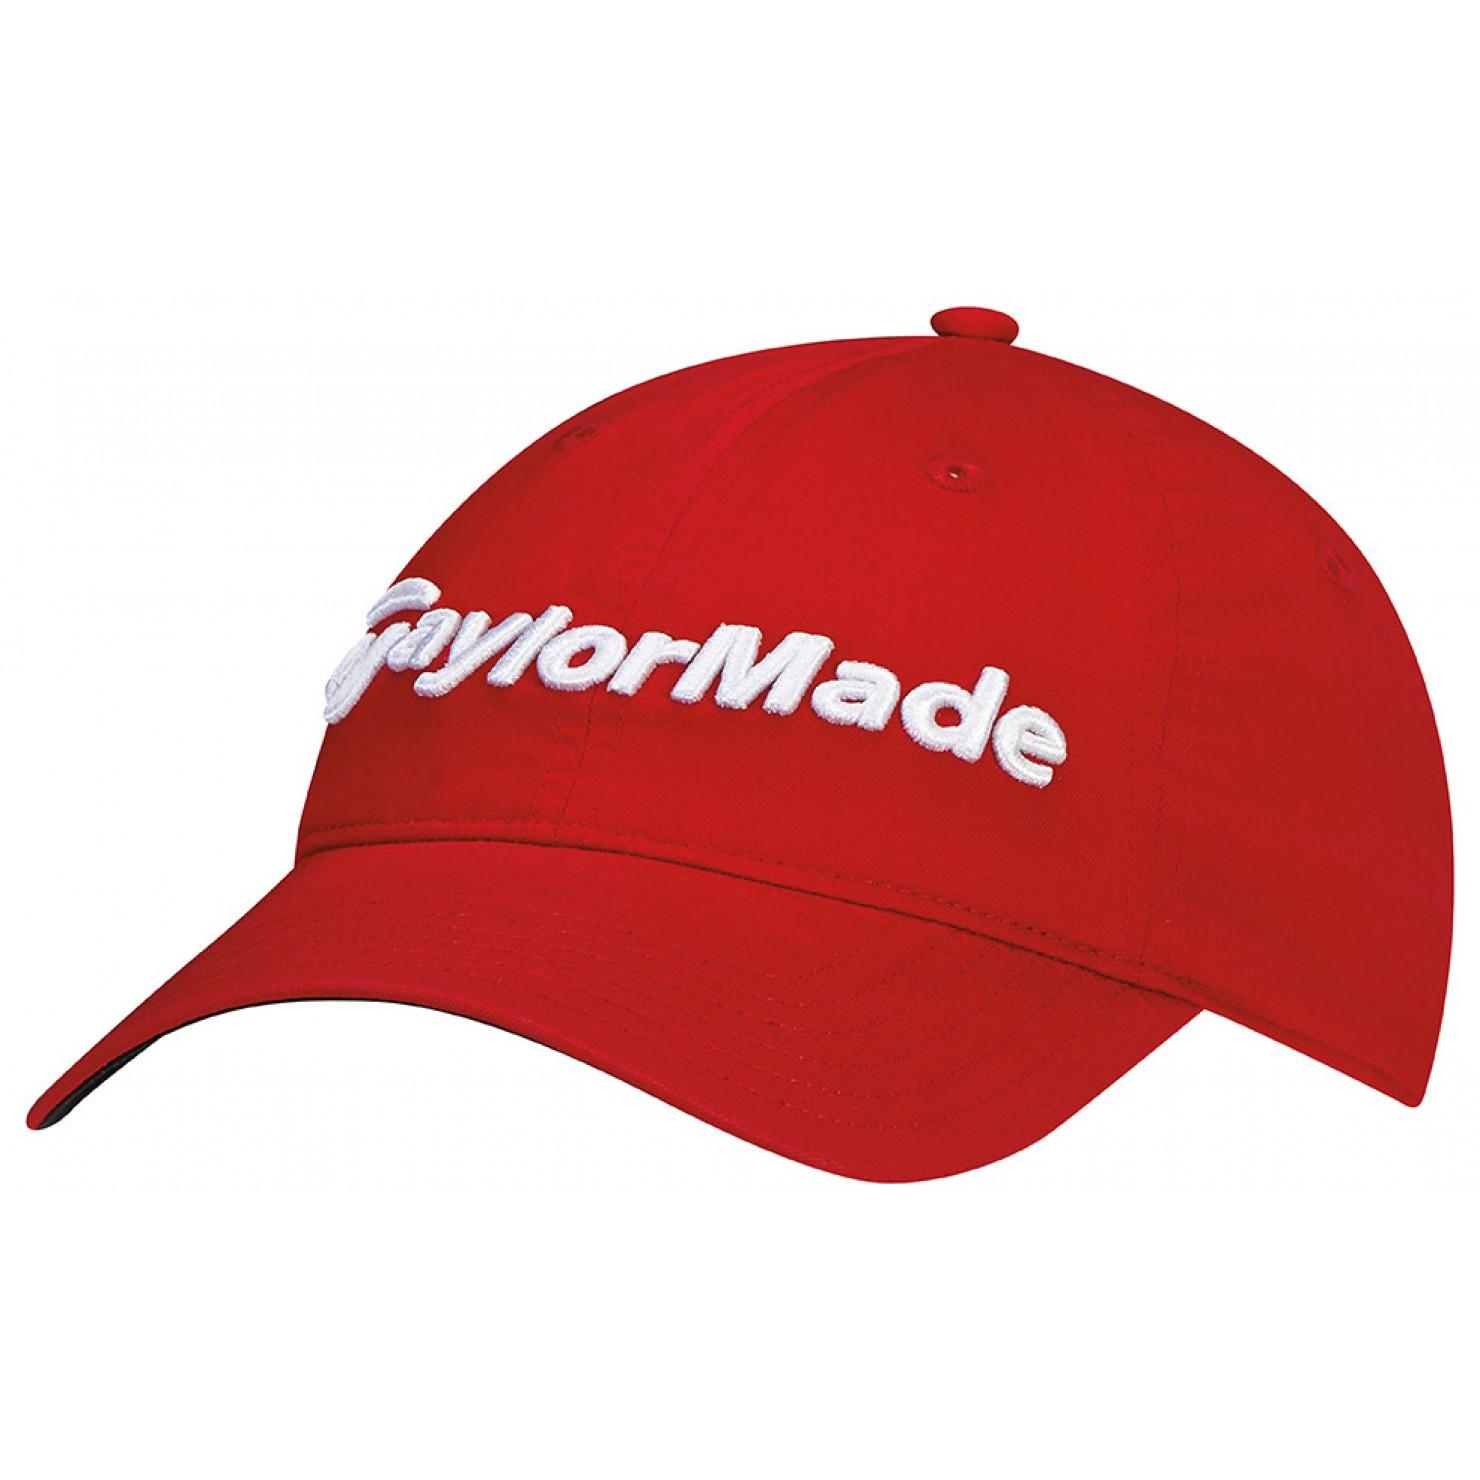 7282db0b3bdd6 ... Tradition Lite Adjustable Hat Cap New TaylorMade Golf 2017 Lifestyle  Tradition Lite Adjustable Hat Cap New TaylorMade Golf 2017 Lifestyle  Tradition Lite ...